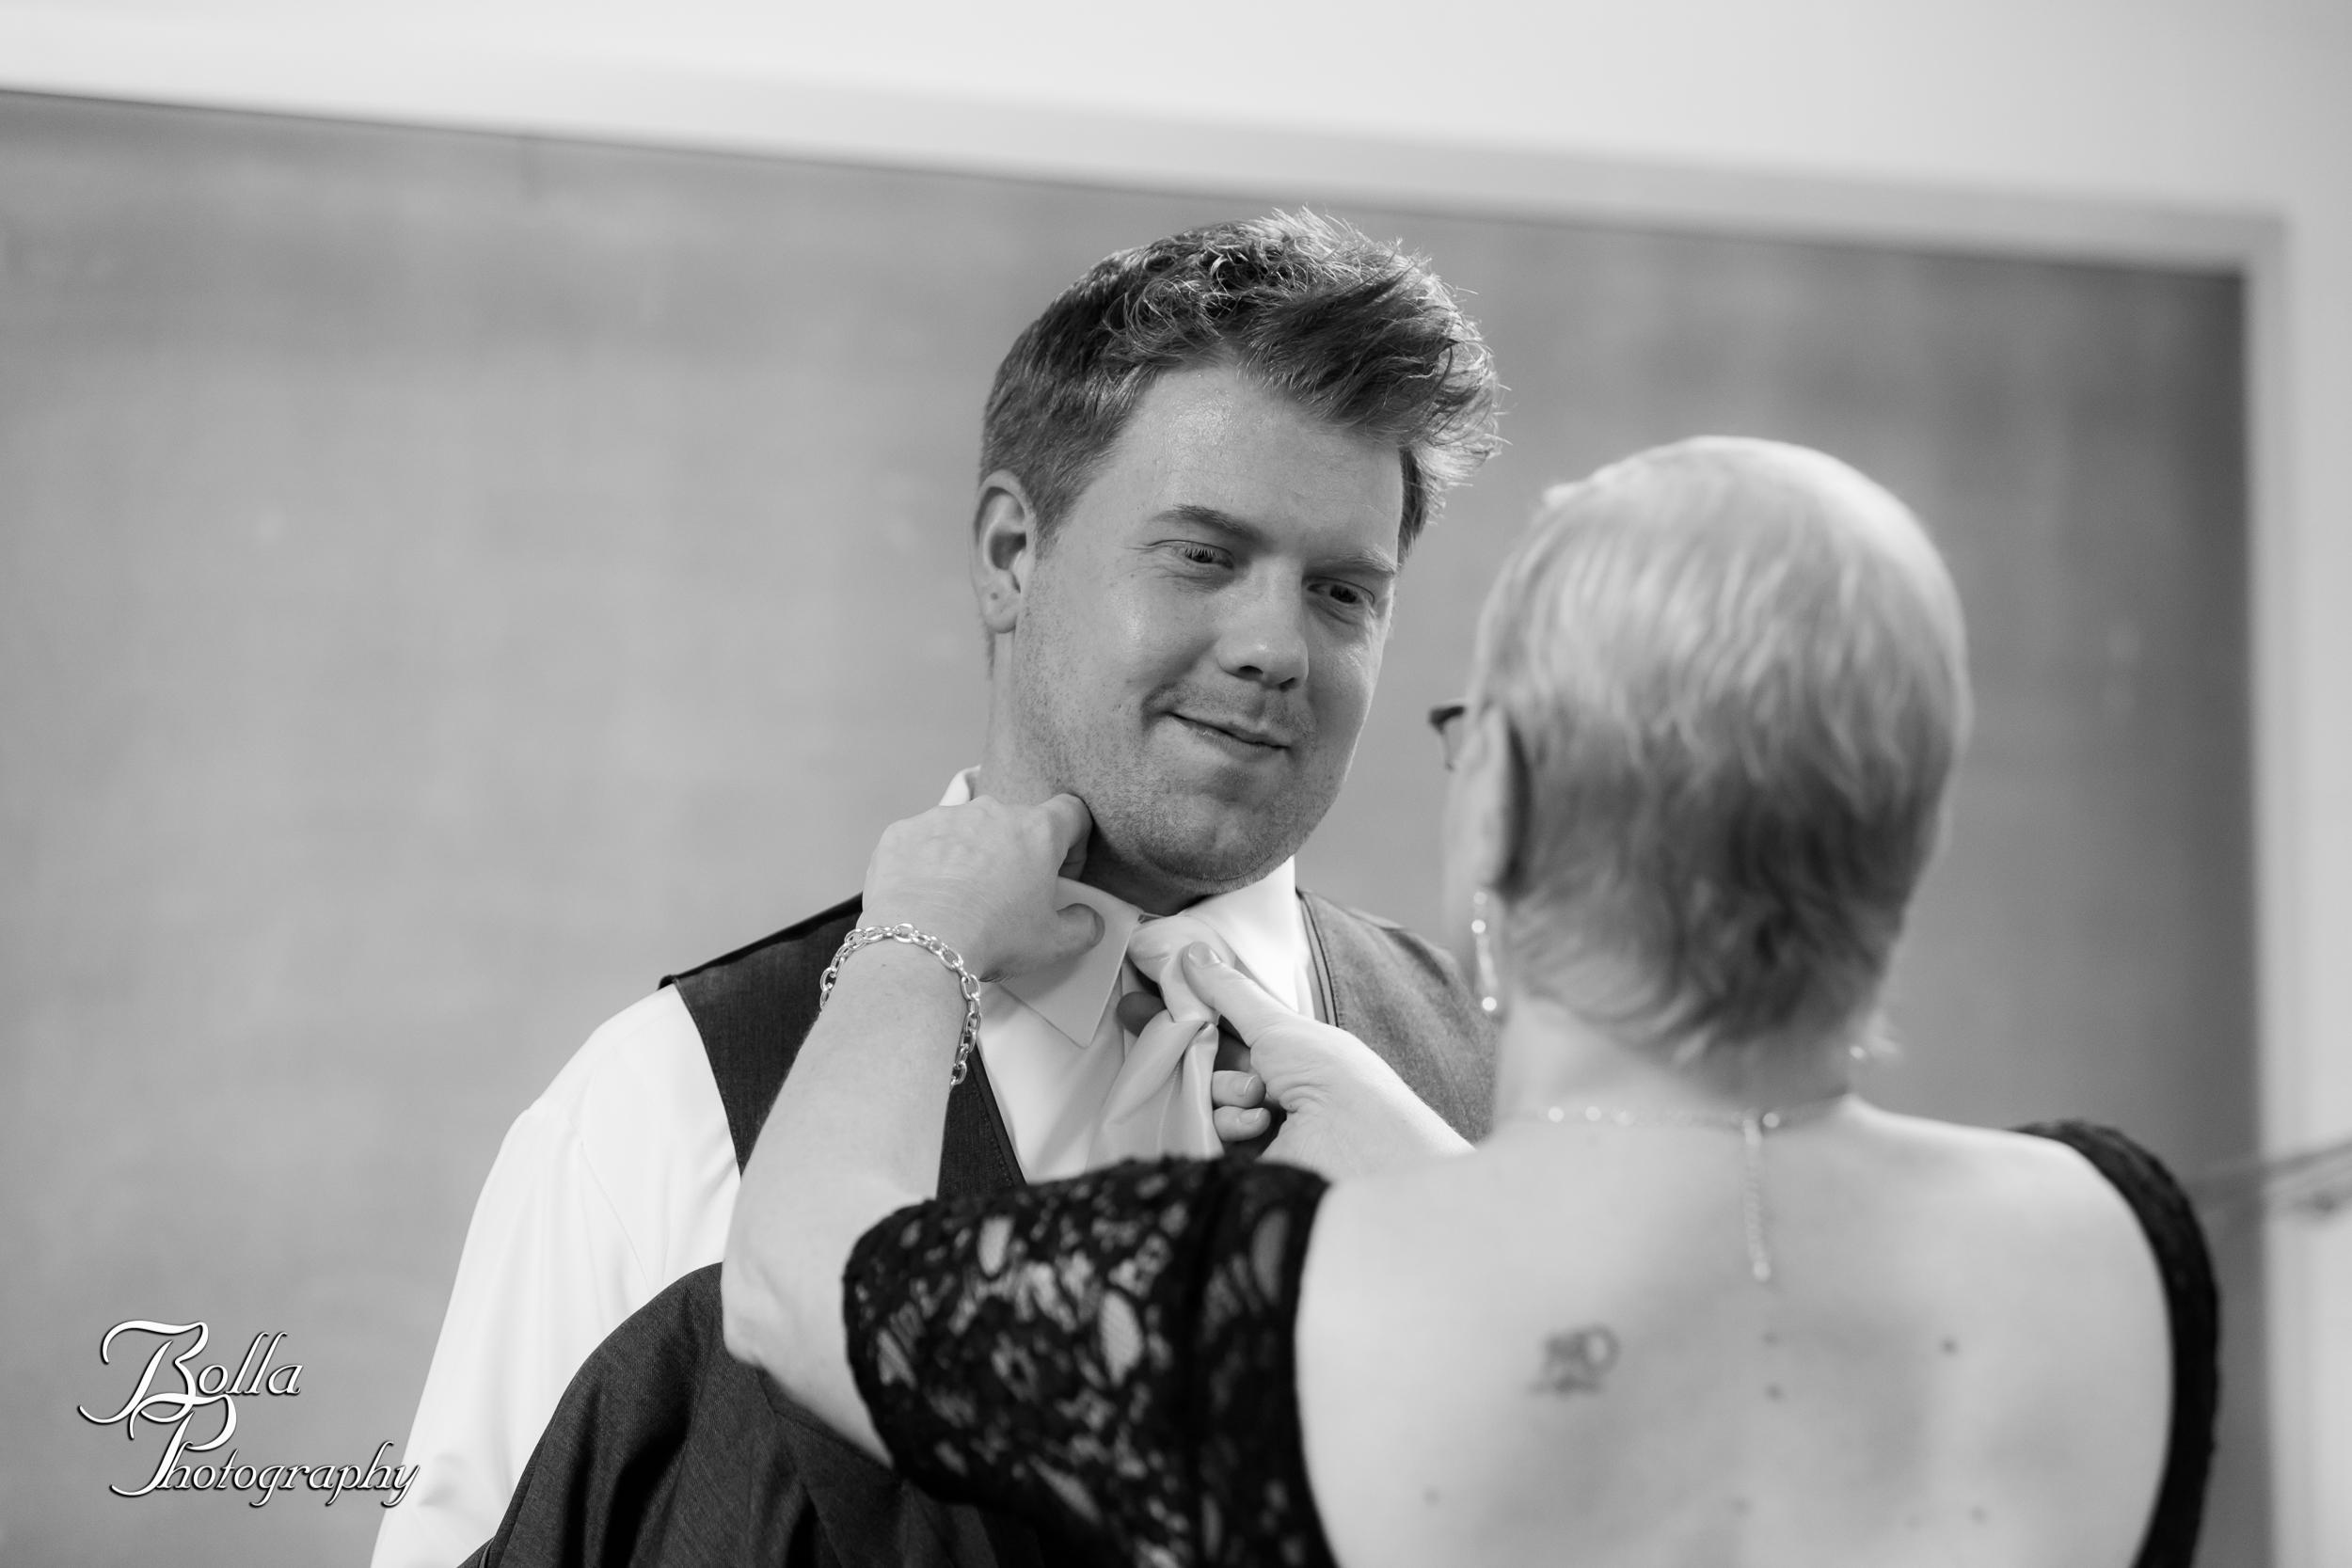 Bolla_photography_edwardsville_wedding_photographer_st_louis_weddings_Reilmann-0043.jpg